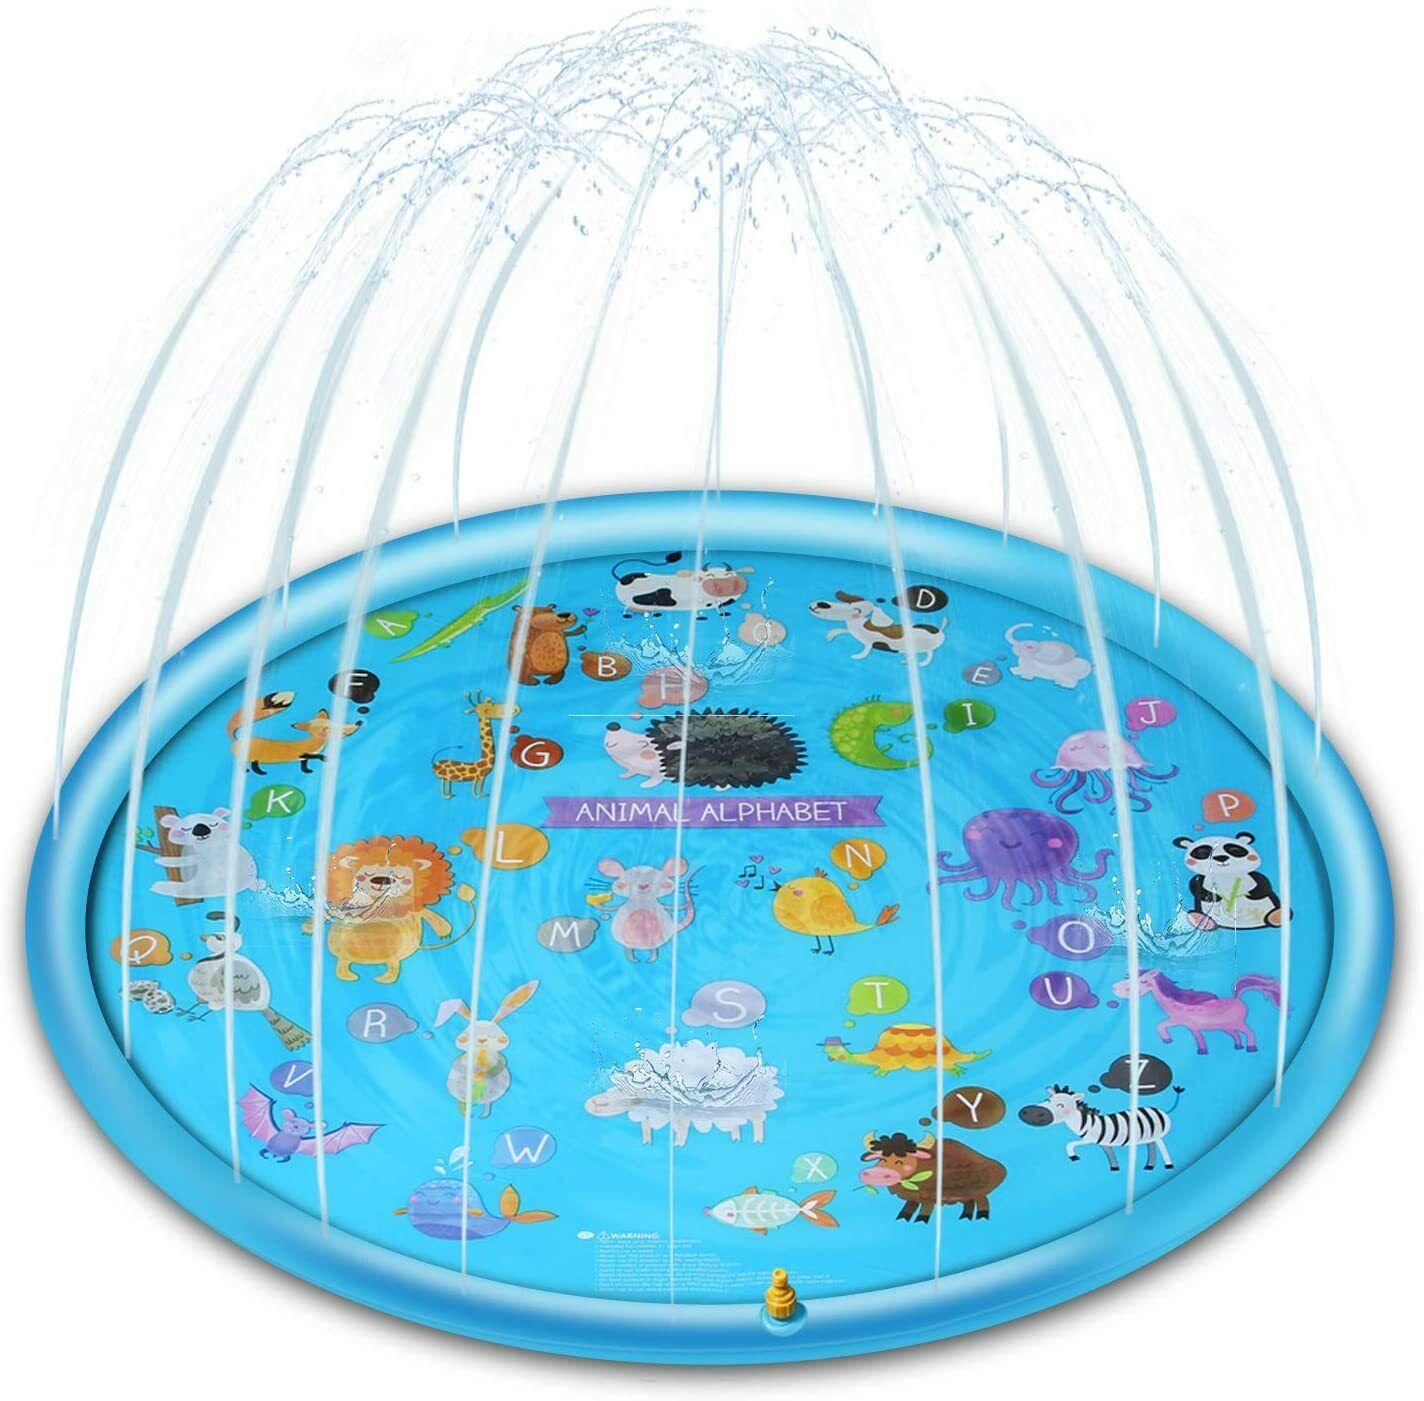 Sprinkler Splash Pad Kids Toddlers 67 inch Water Spray Play Mat ABC Animals